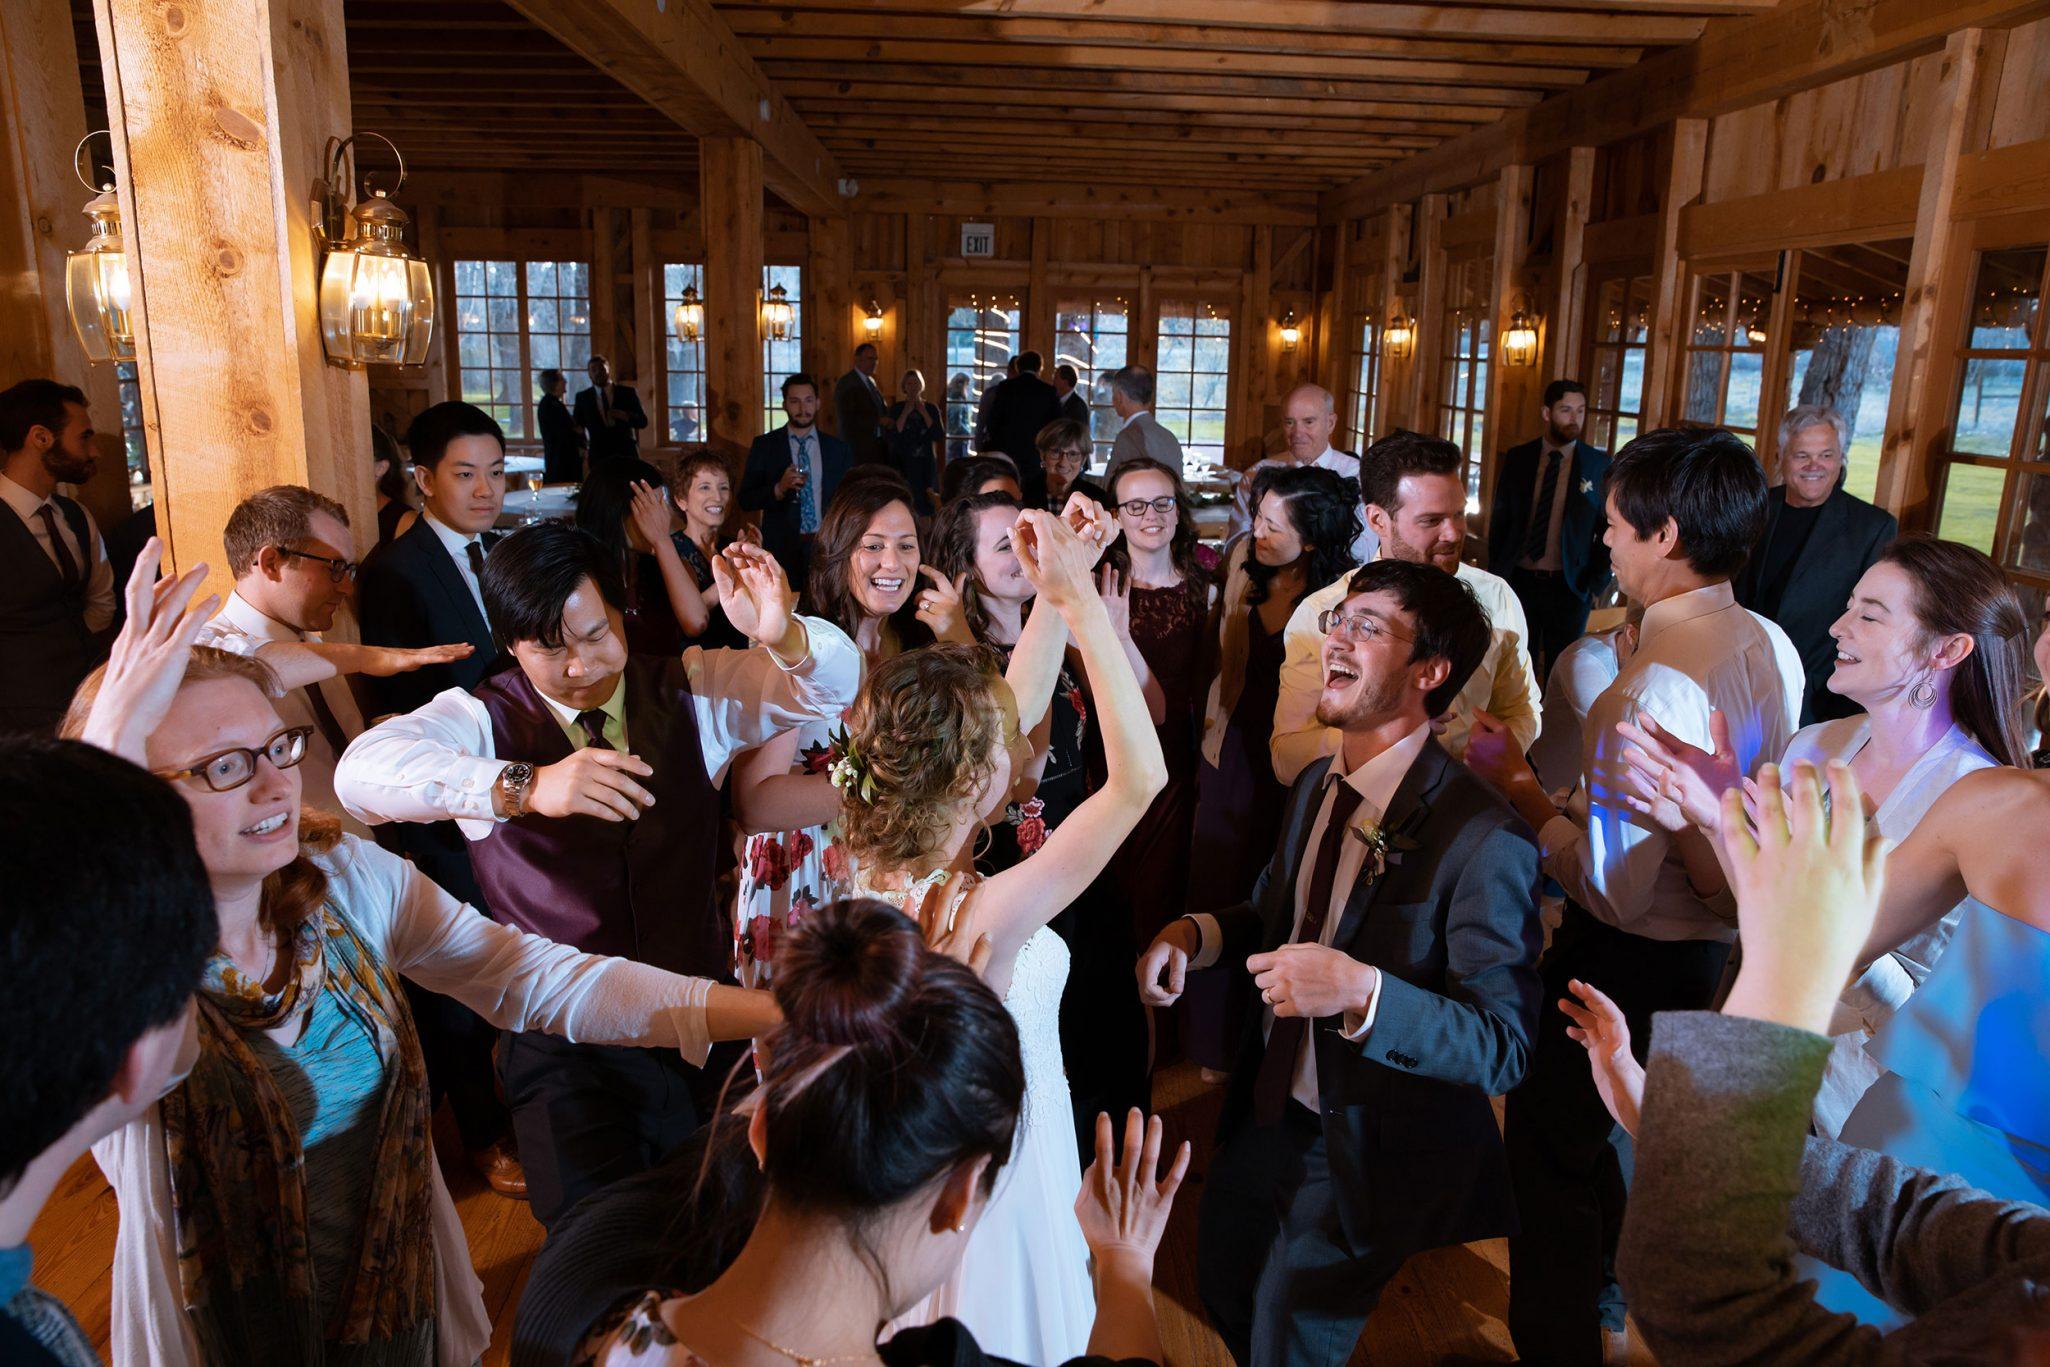 Reception dance party at Ridgewood Event Center by Kara Cavalca